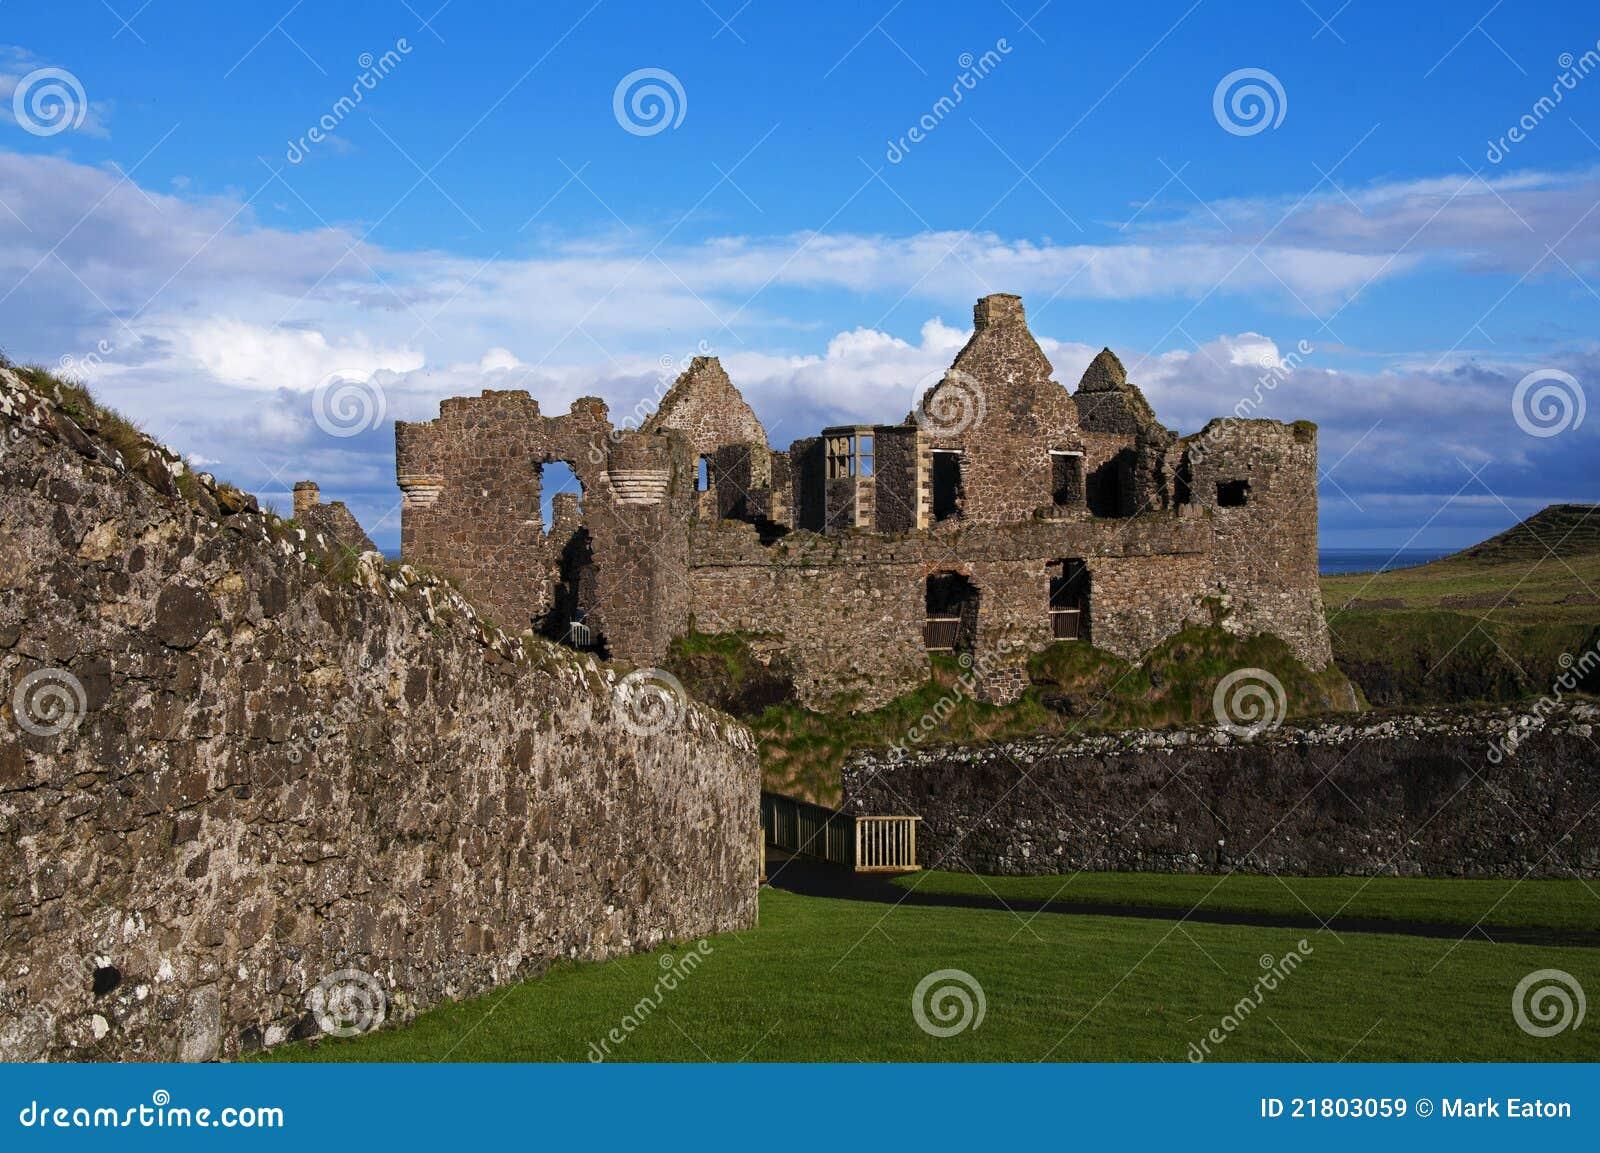 The Ruins of Dunluce Castle